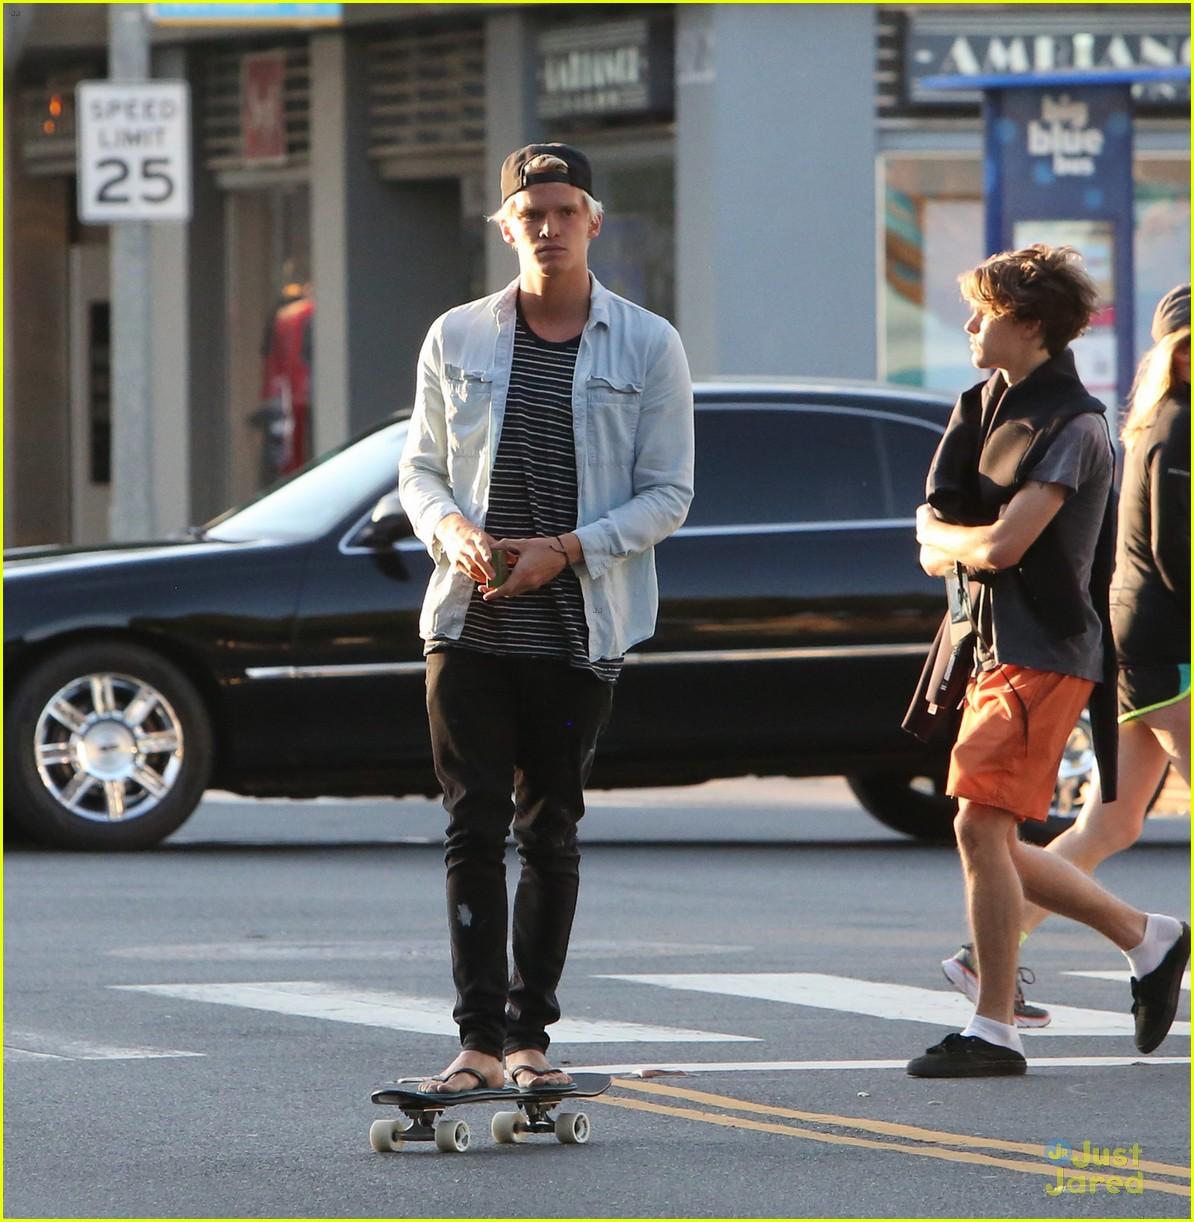 cody simpson skateboard alli 18th birthday 04